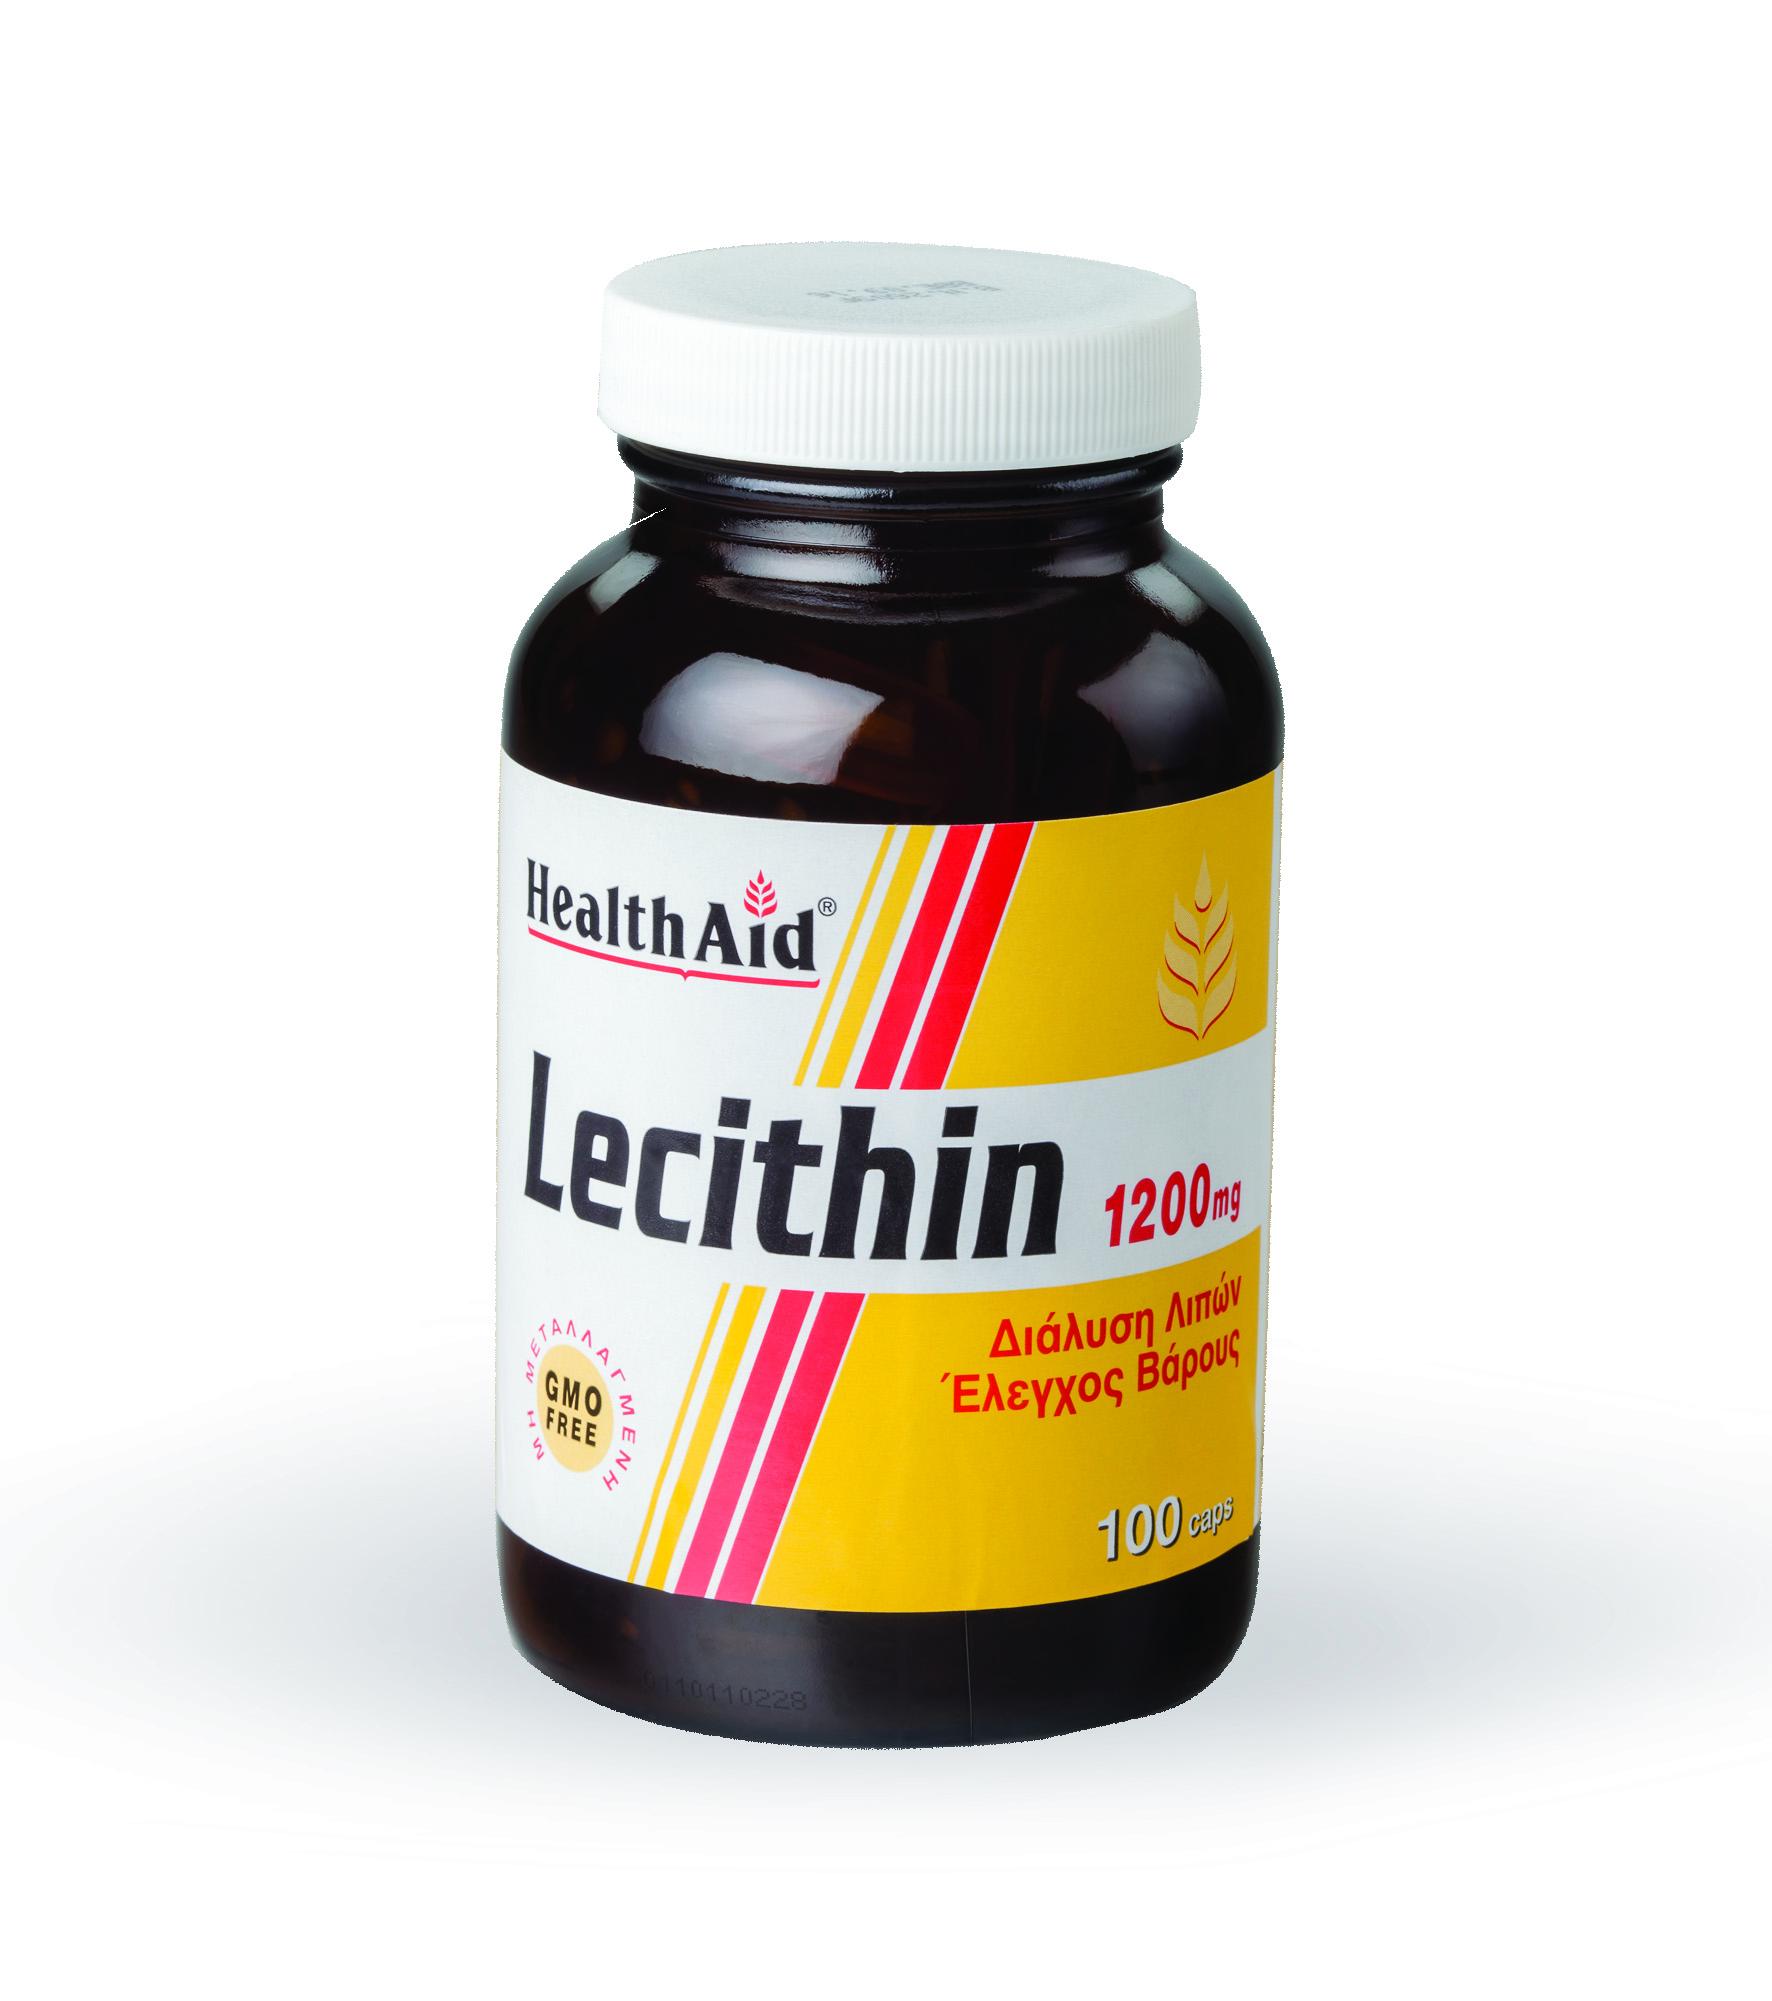 Health Aid Super Lecithin Ισχυρό Αντιοξειδωτικό 1200Mg – 100 tabs